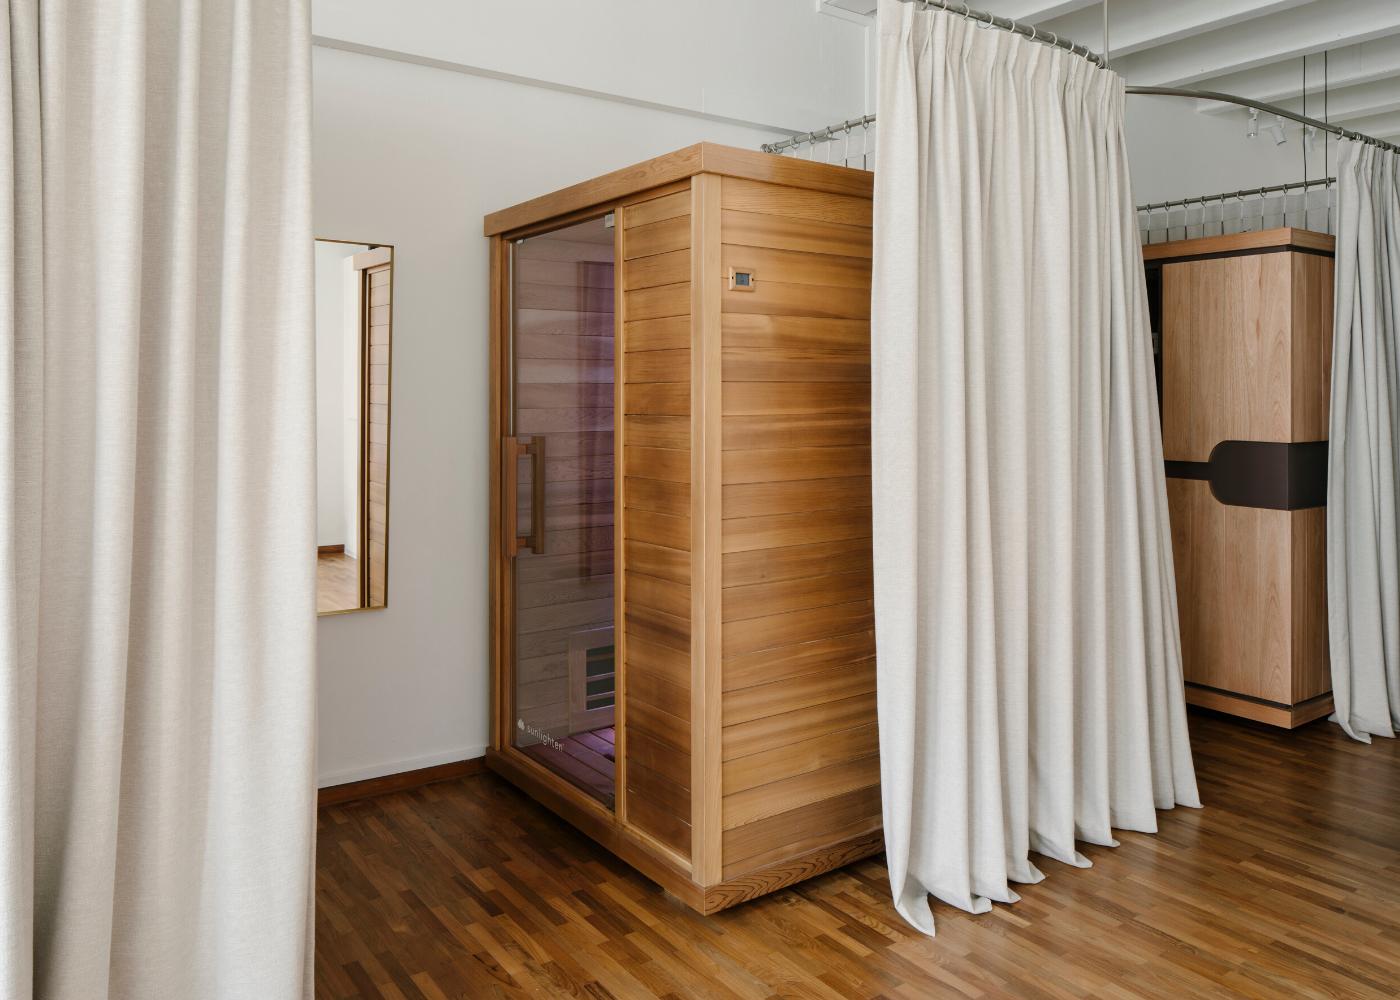 Pure Wellness Studio | Singapore's first dedicated infrared sauna | Alternative healing therapies